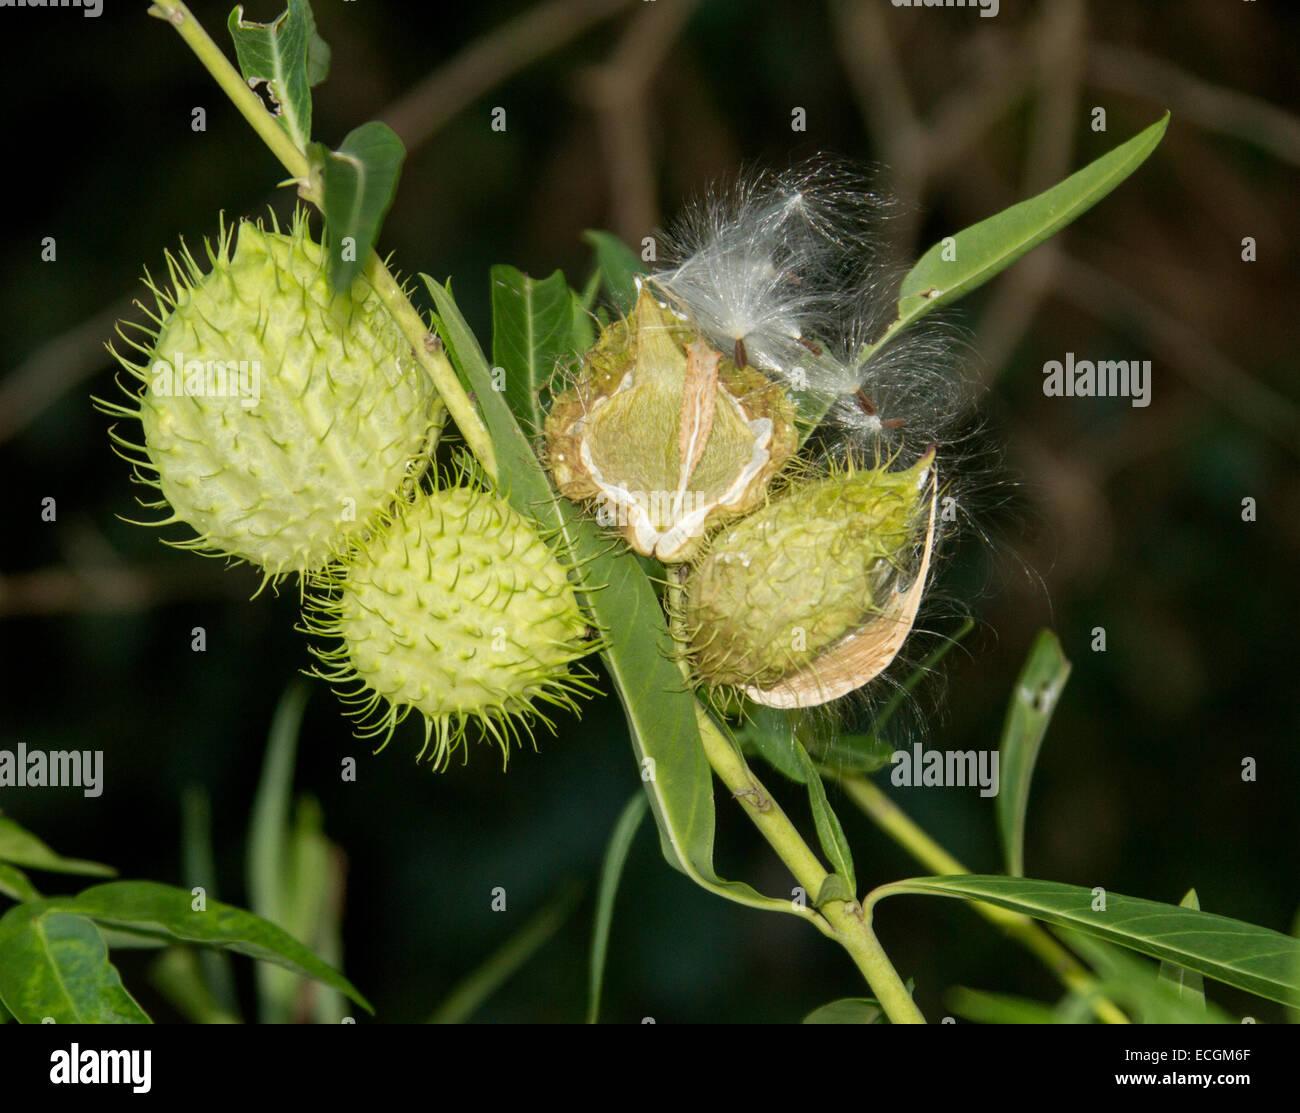 Seed Pods Of Weed Gomphocarpus Hysocarpus Balloon Cotton